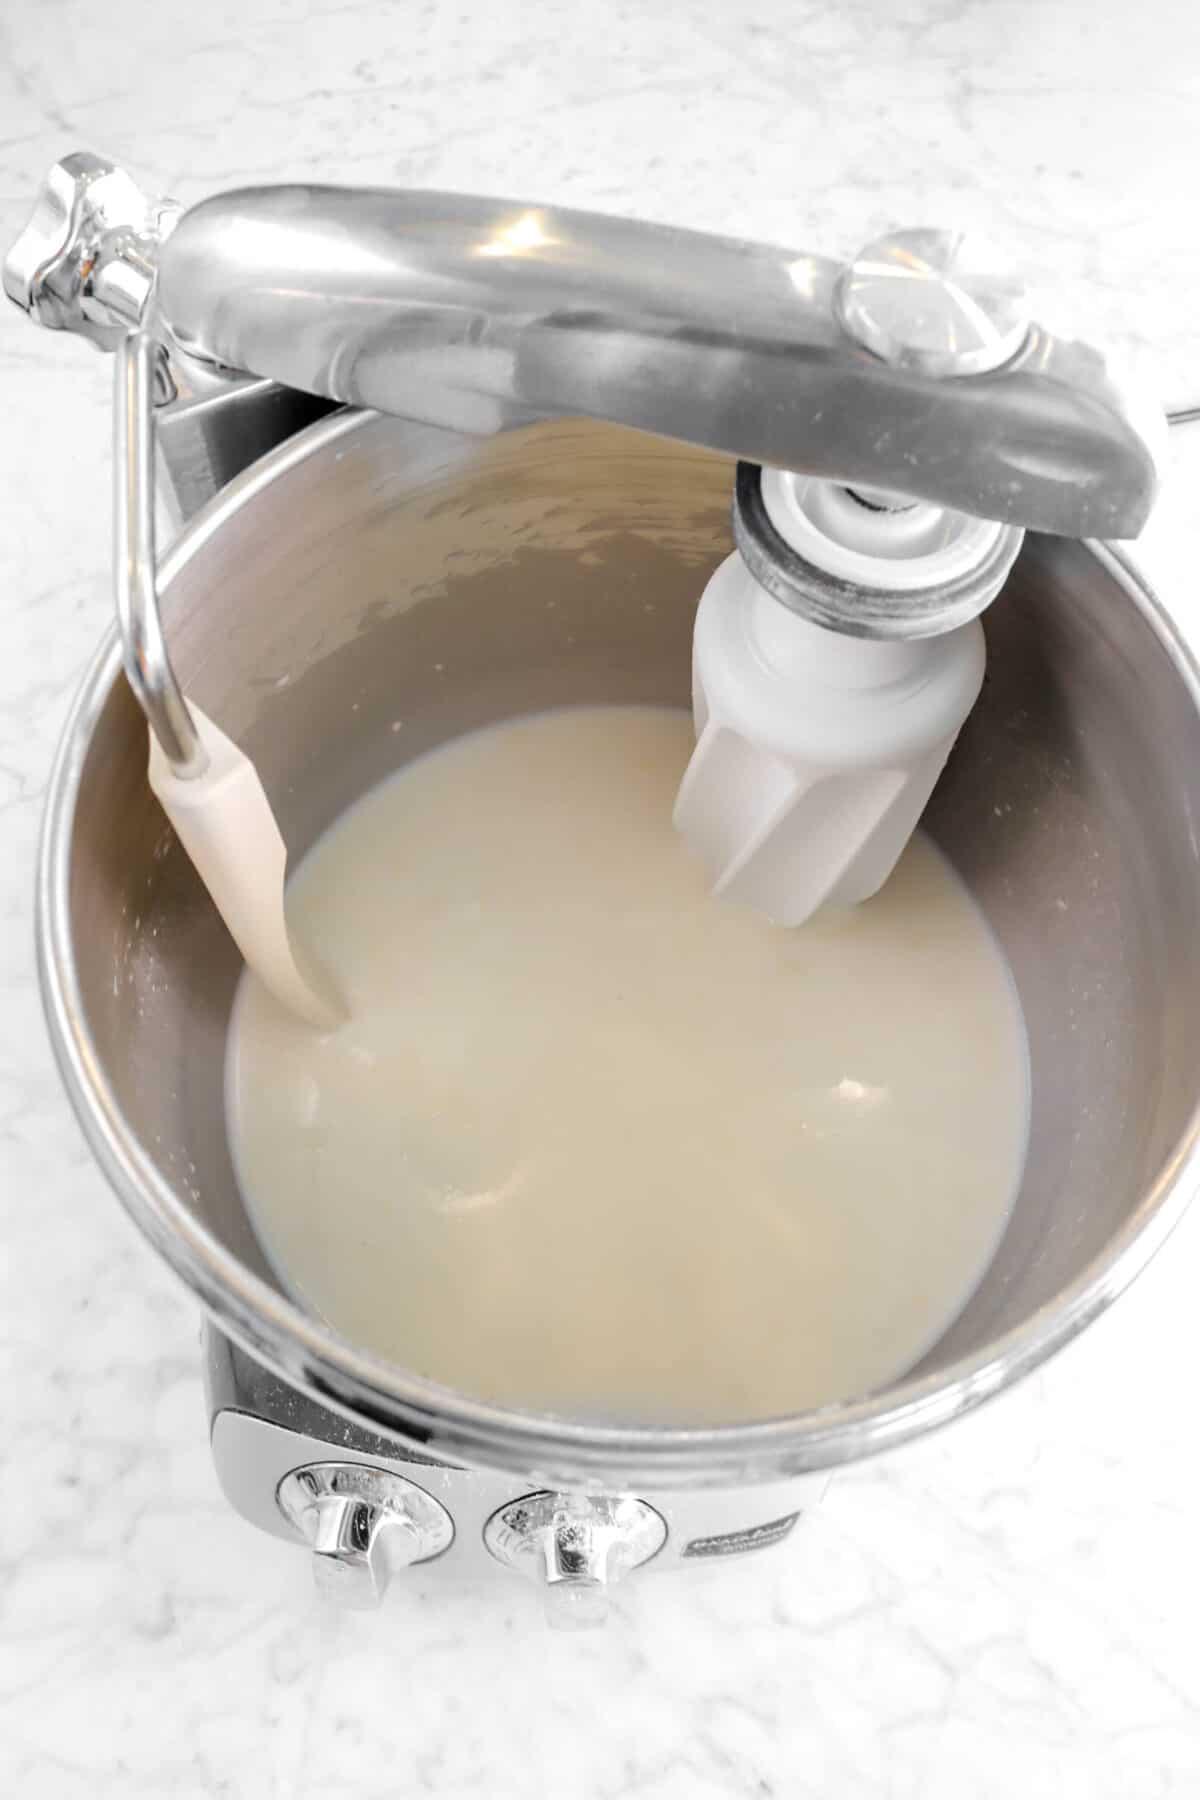 sourdough mixed into milk mixture